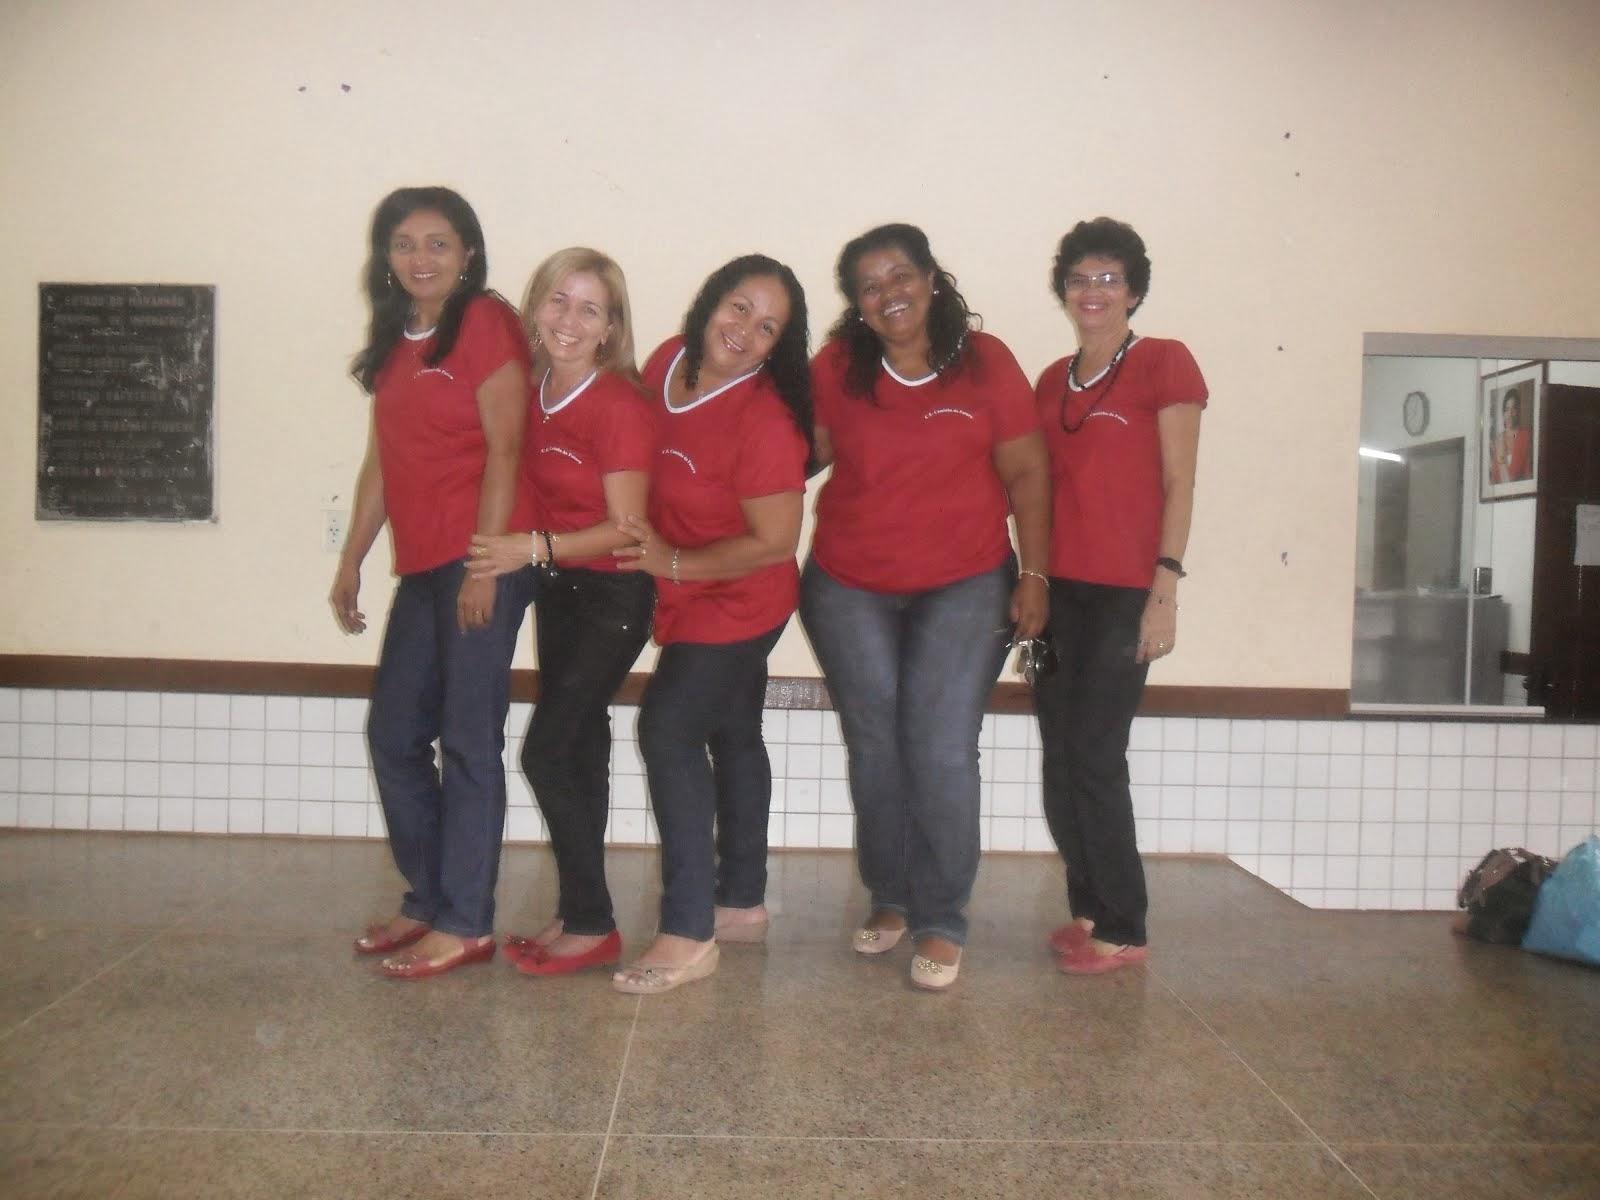 Diretora Maria José, Coord. Rosilda, Mello,Vice-diretora Dalva  e Selma